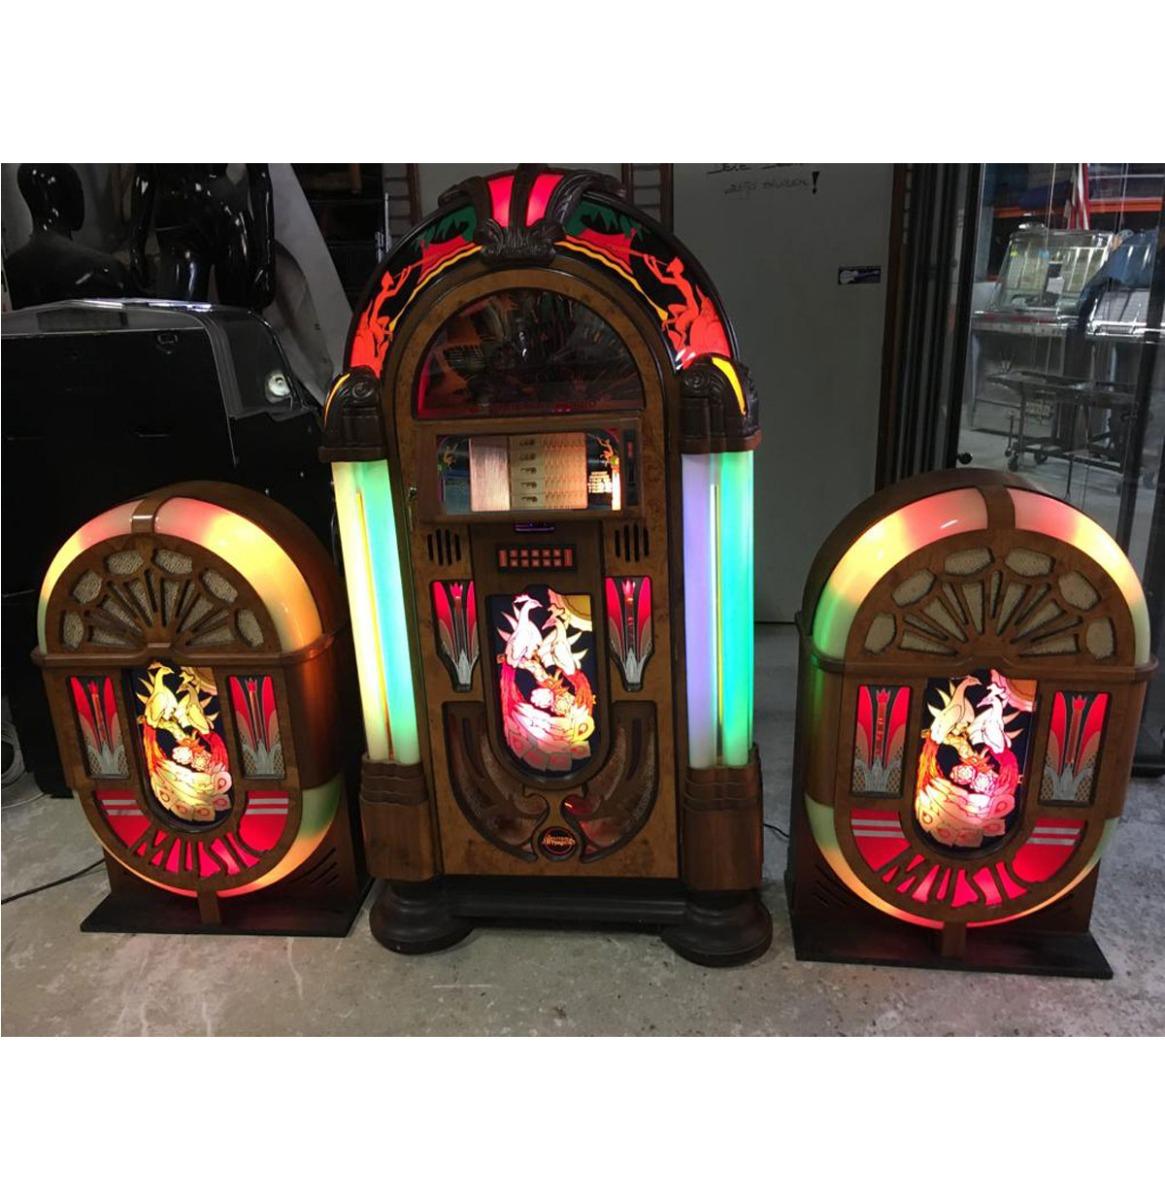 Antique Apparatus Gazelle Jukebox - 45RPM - 200 Selecties - 90's Model - Met 2 Speakers